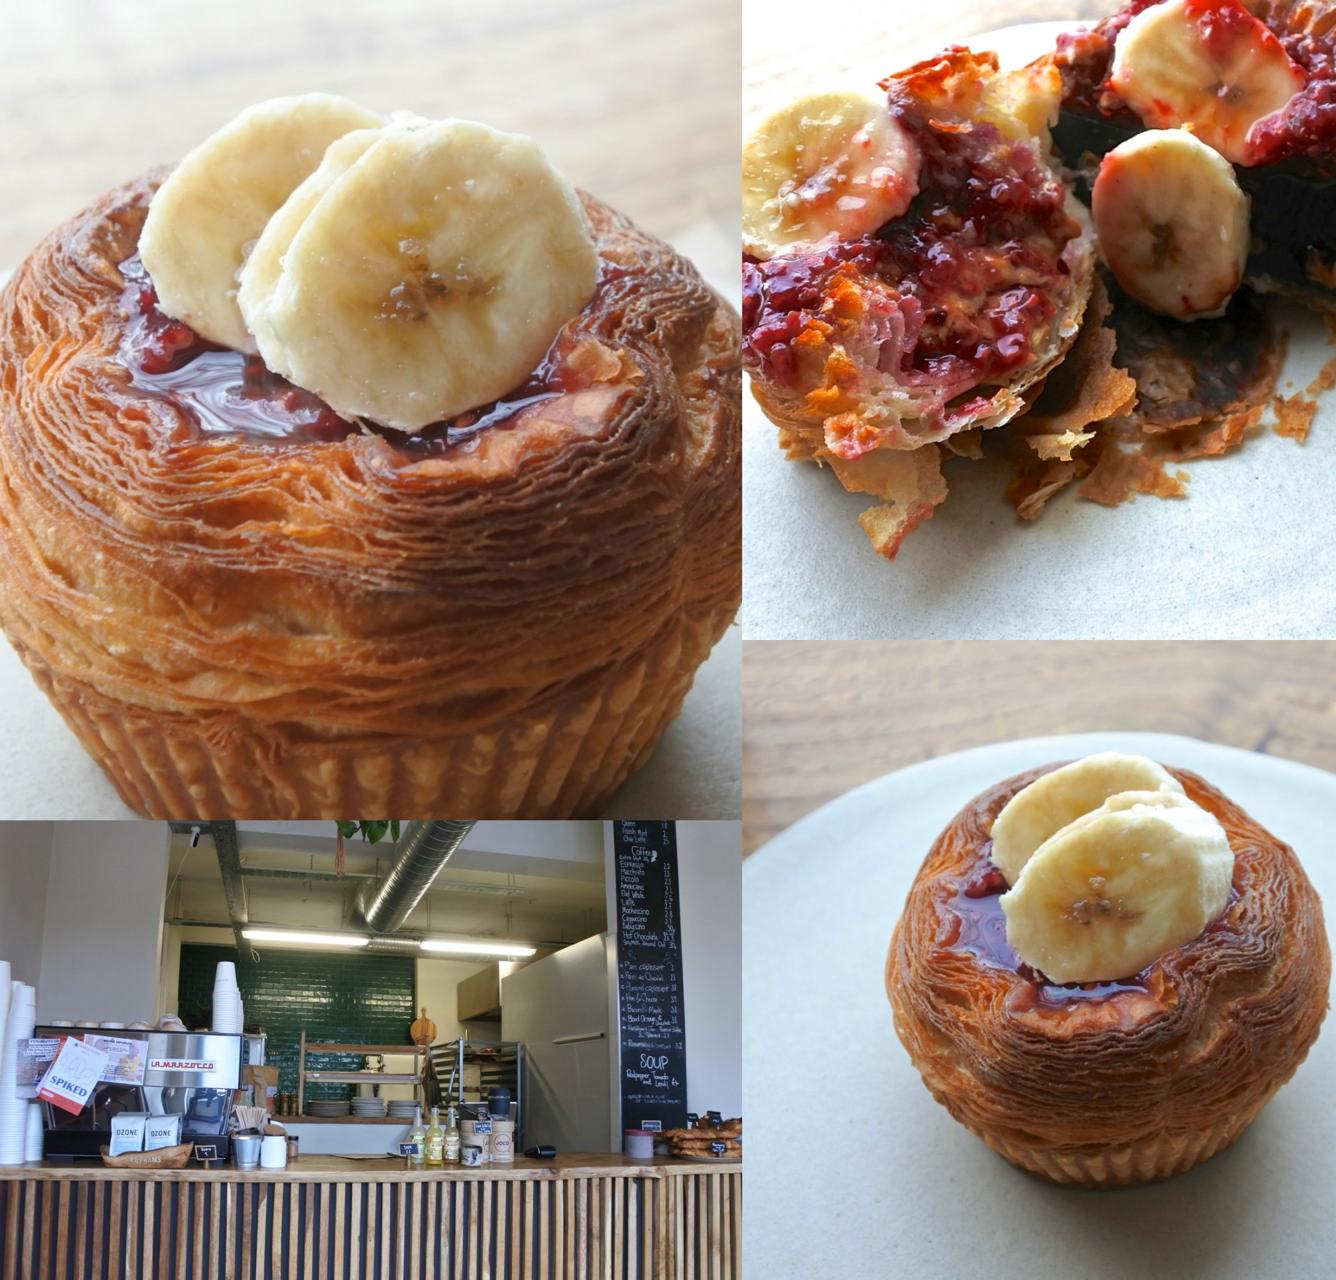 th_Pophams Bakery_4